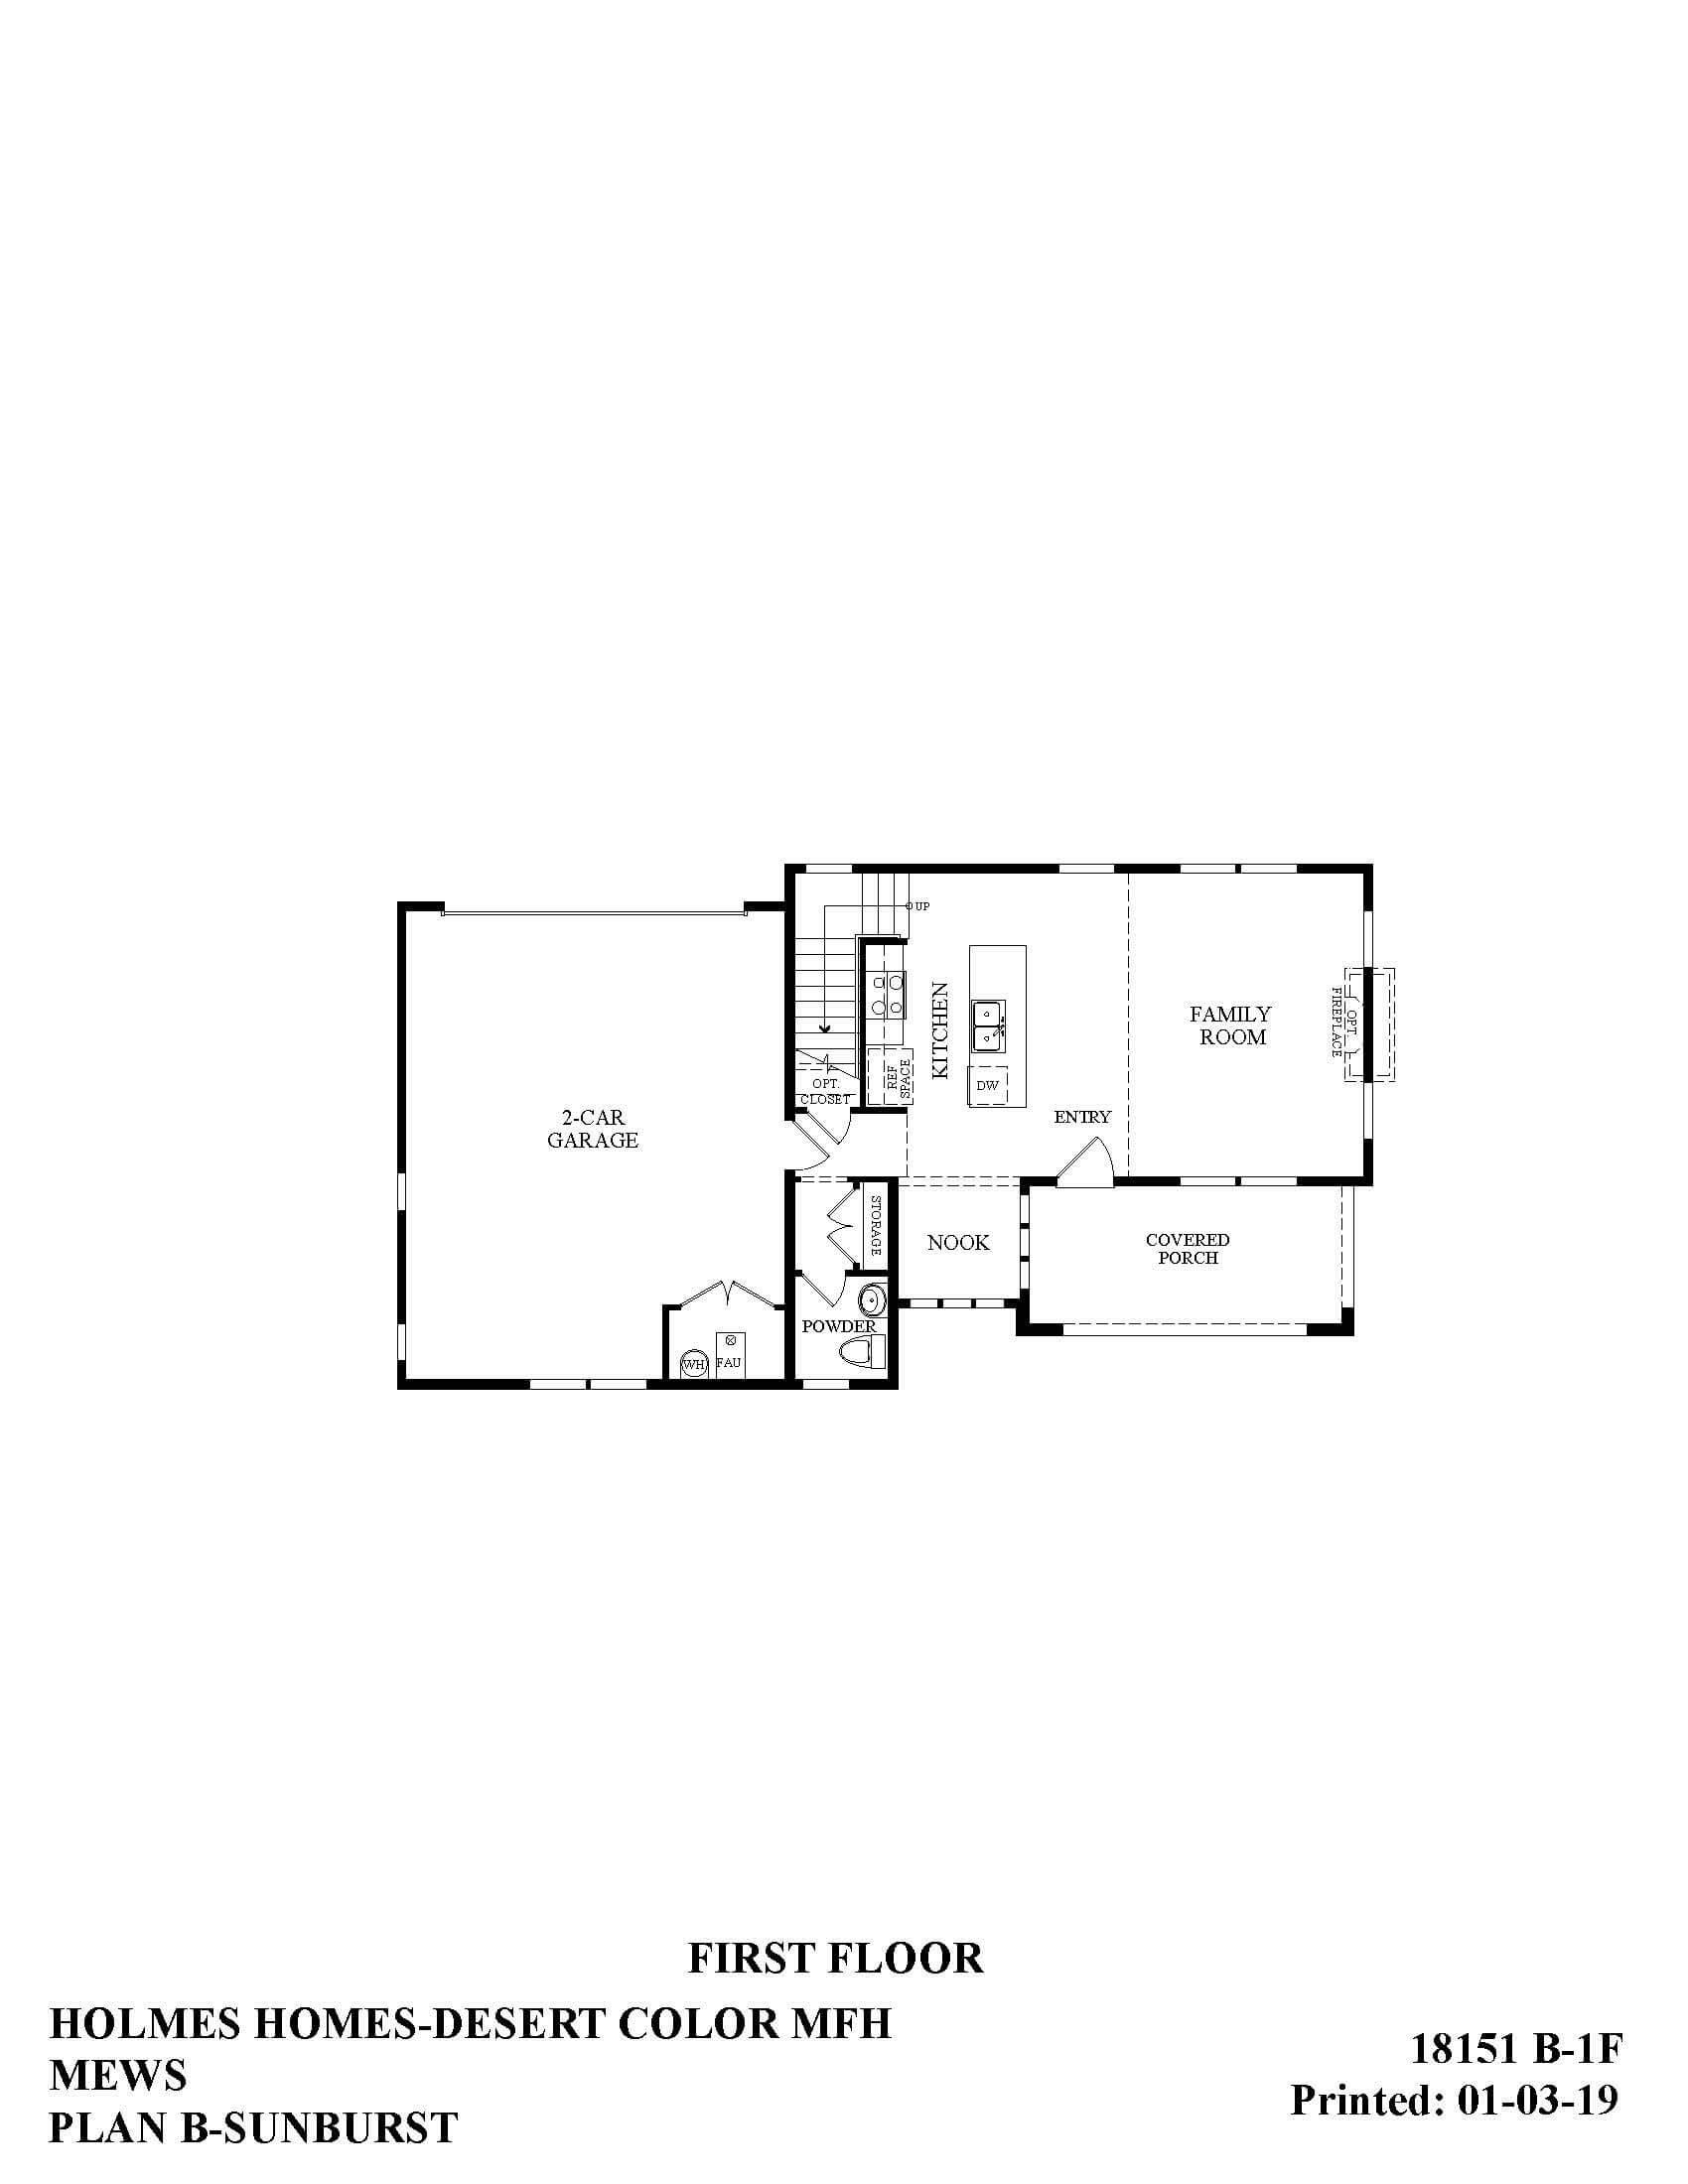 Desert Color Holmes Homes Mews Sunburst First Floor Plan